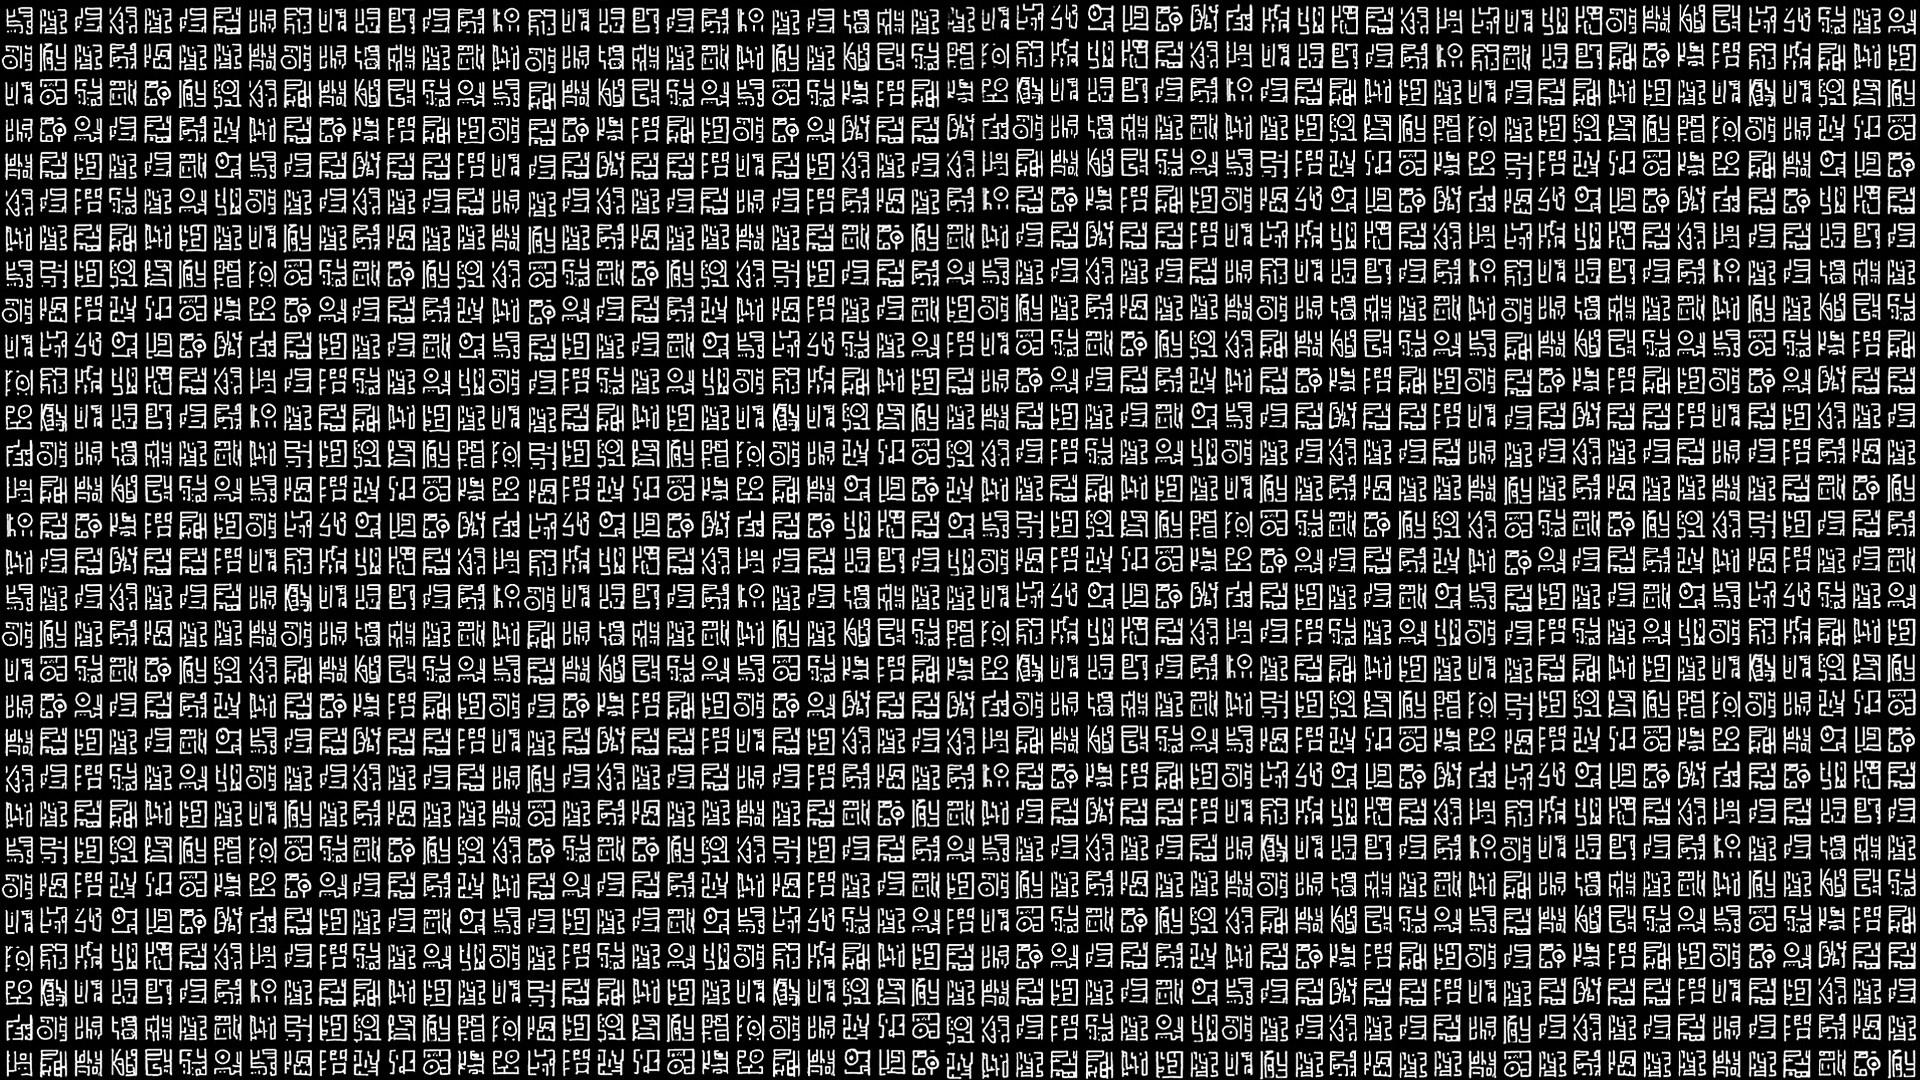 1920x1080-hd-calligraphy-wallpaper-wpc900805